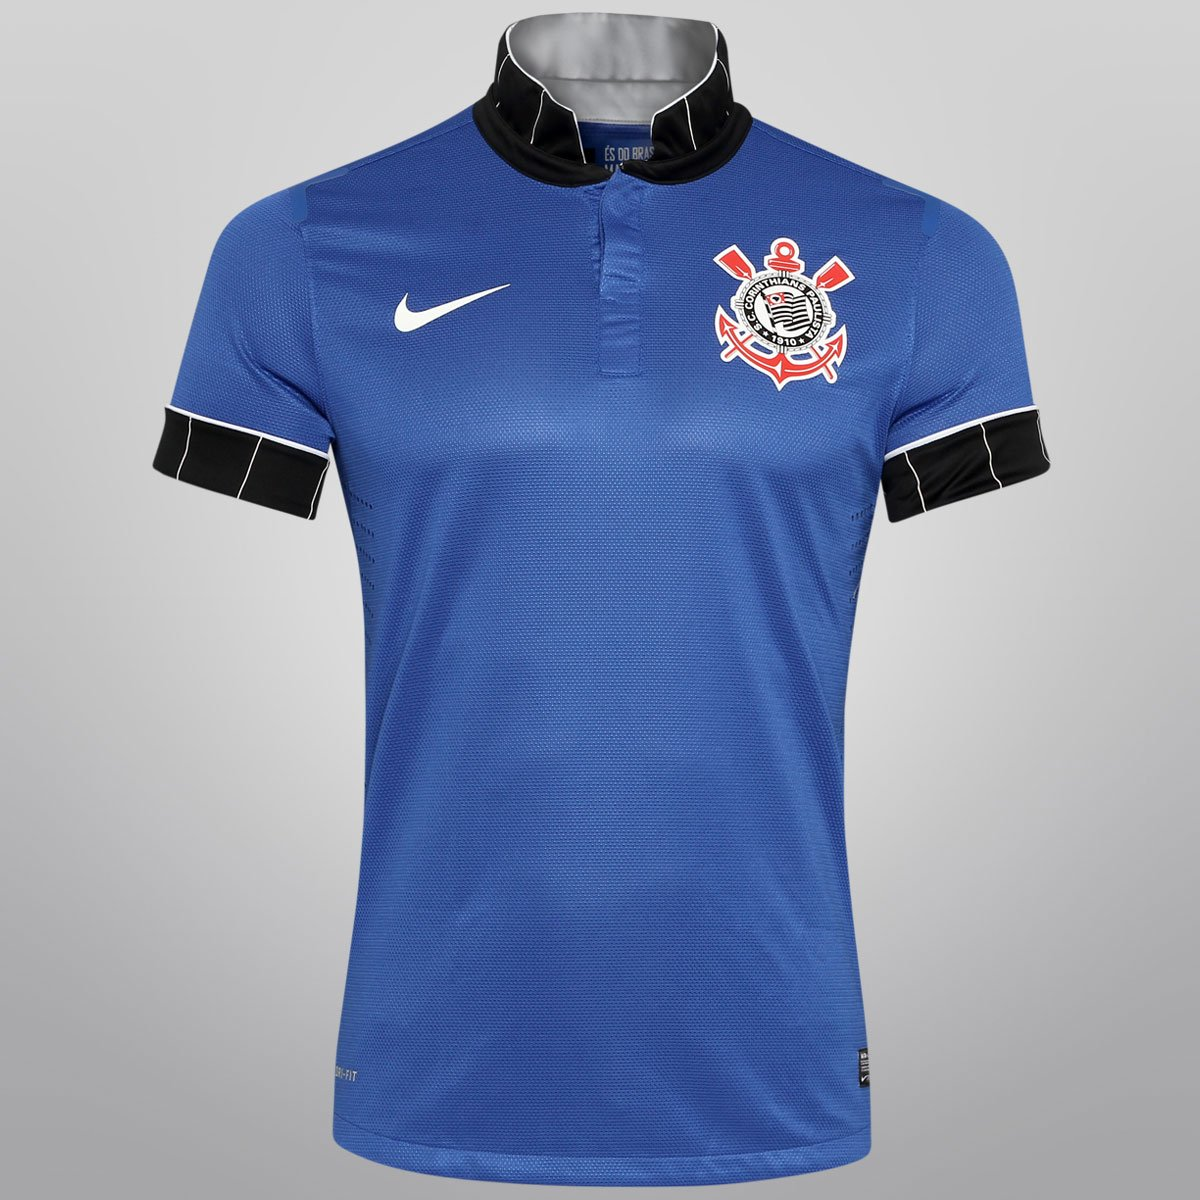 428ab8f9c8446 Camisa Nike Corinthians III 13 14 s nº - Jogador - Compre Agora ...